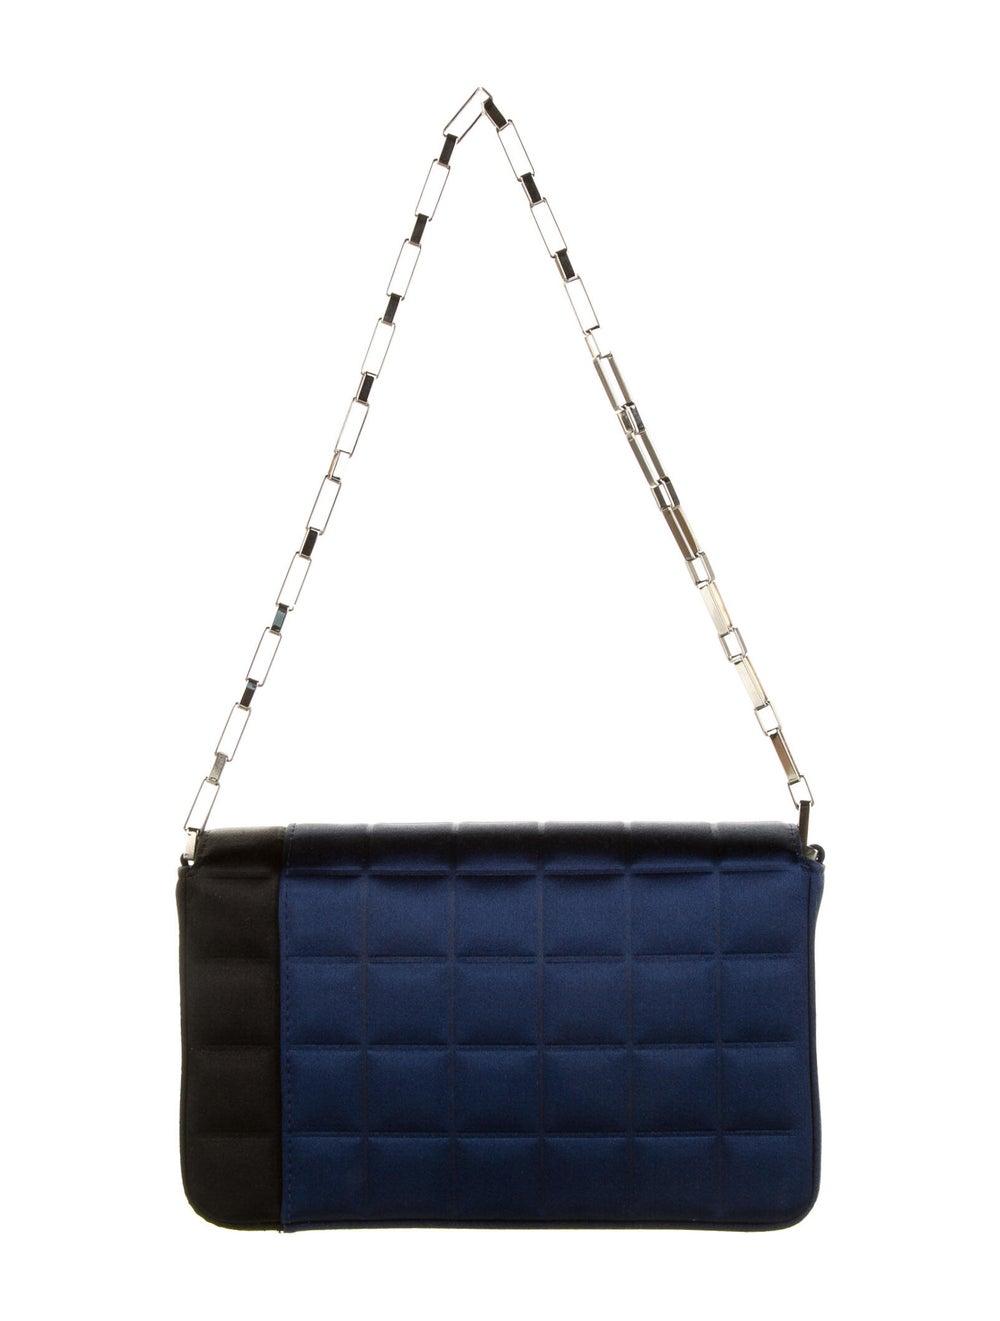 Chanel Satin Square Quilt Flap Bag Blue - image 4